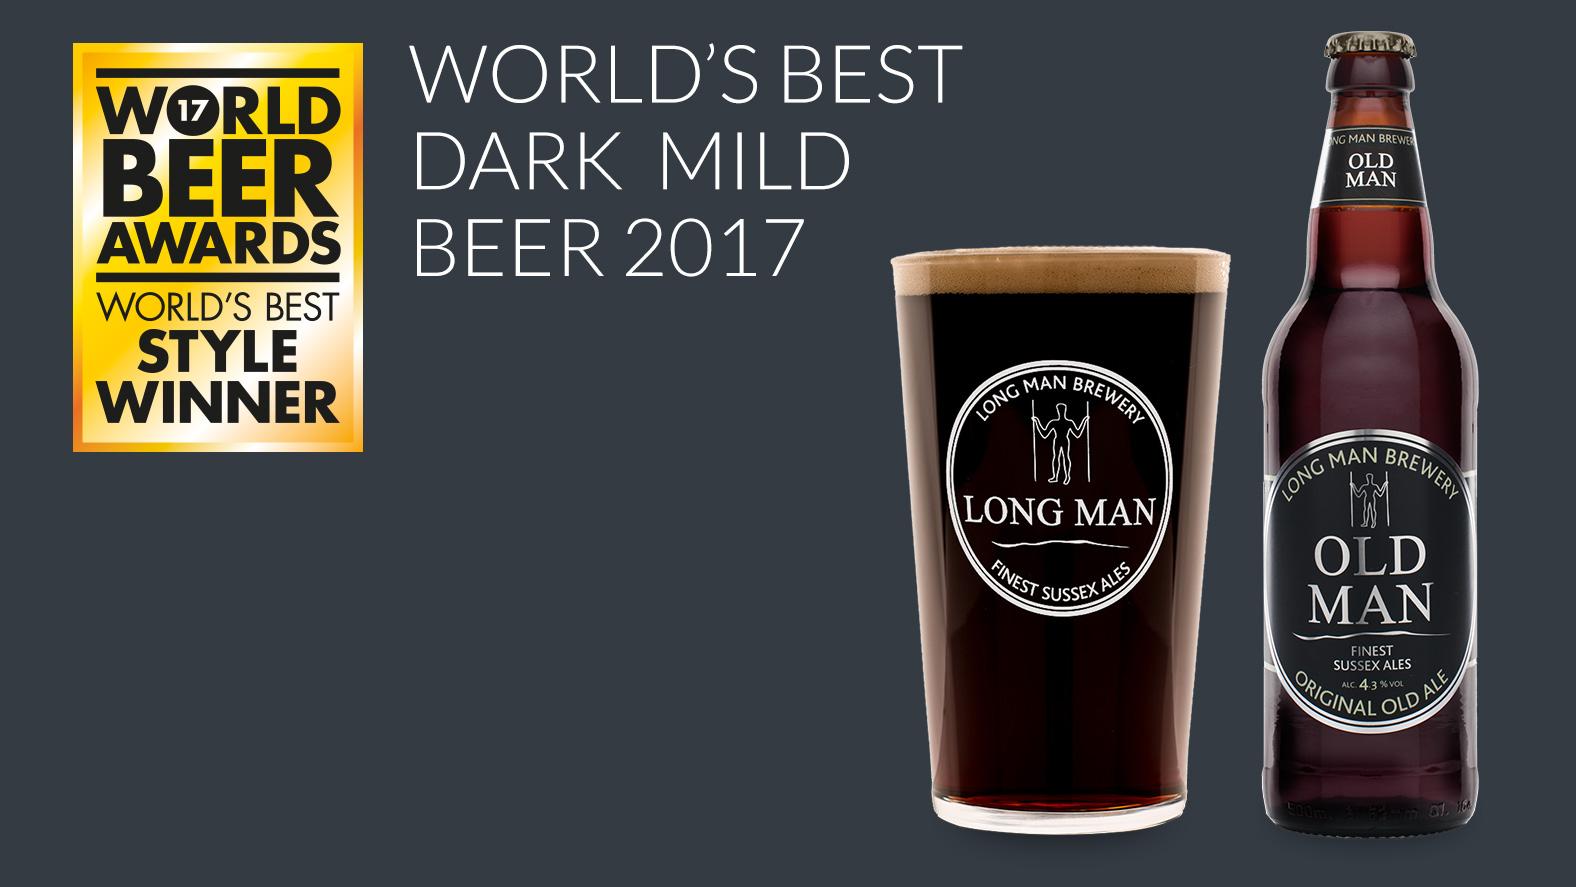 World Beer Awards 2017, Worlds Best, Old Man